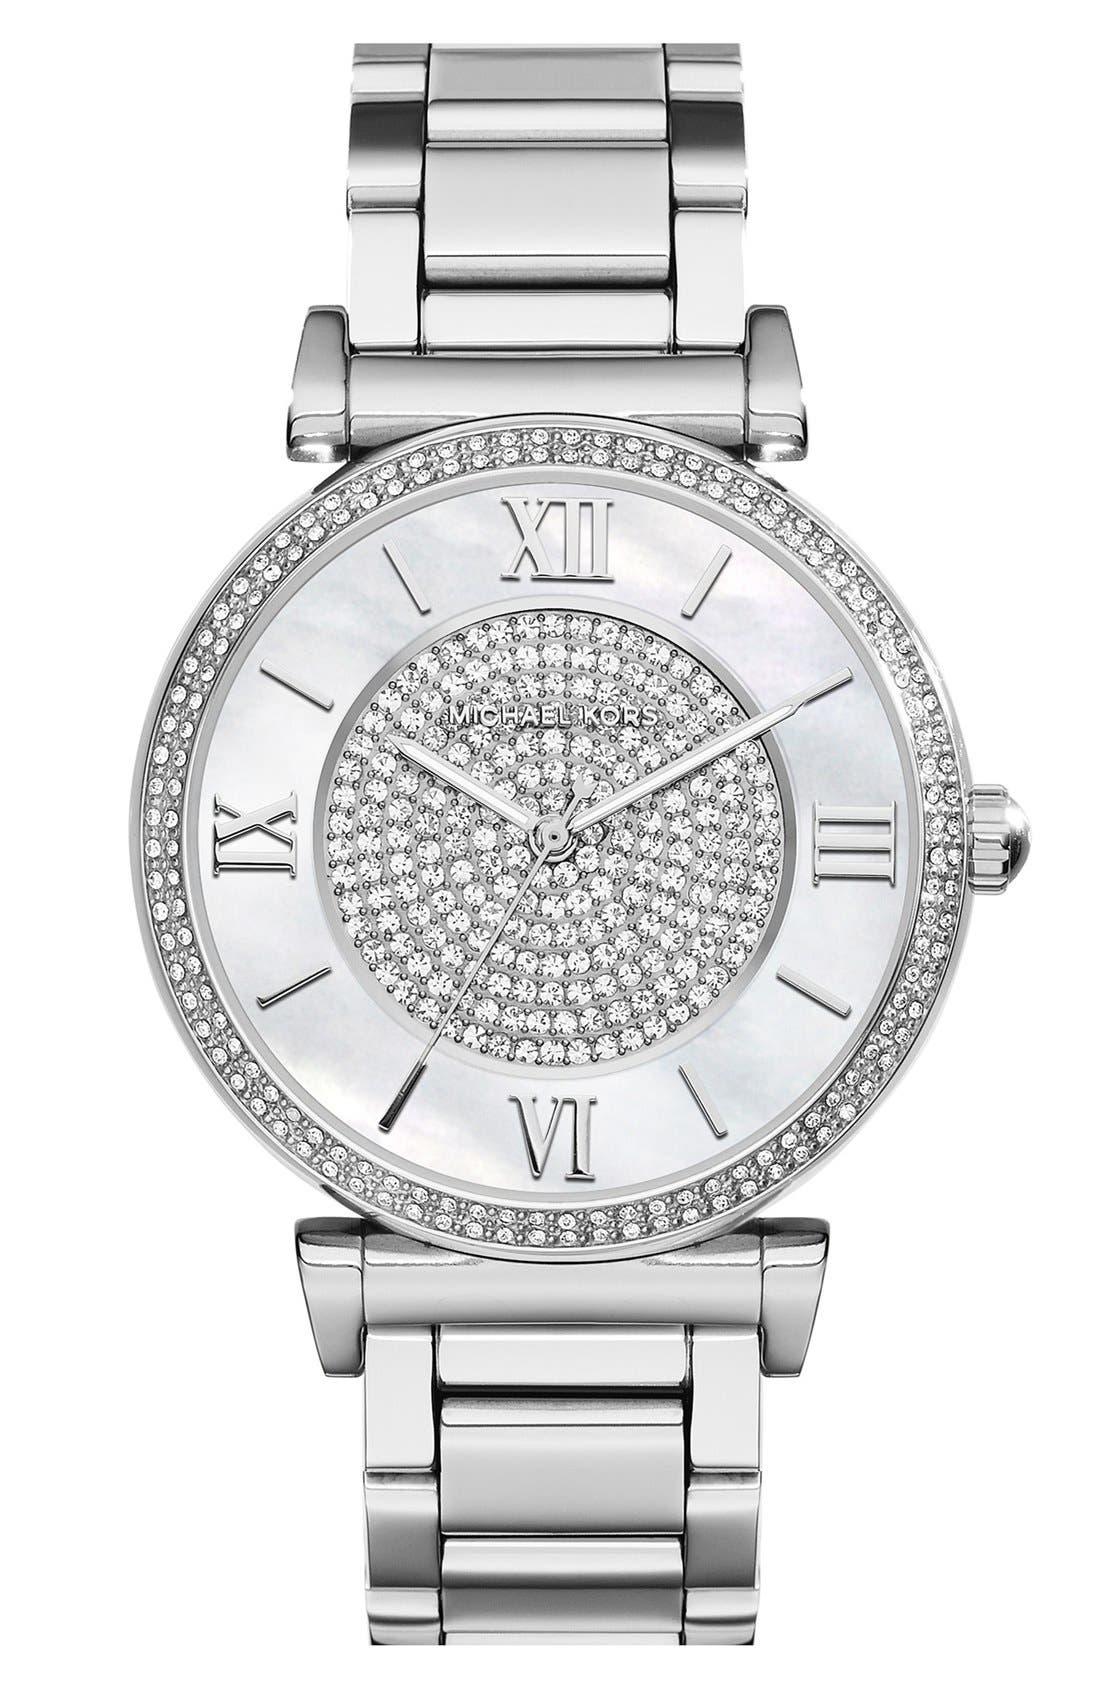 Alternate Image 1 Selected - Michael Kors 'Caitlin' Crystal Dial Bracelet Watch, 38mm